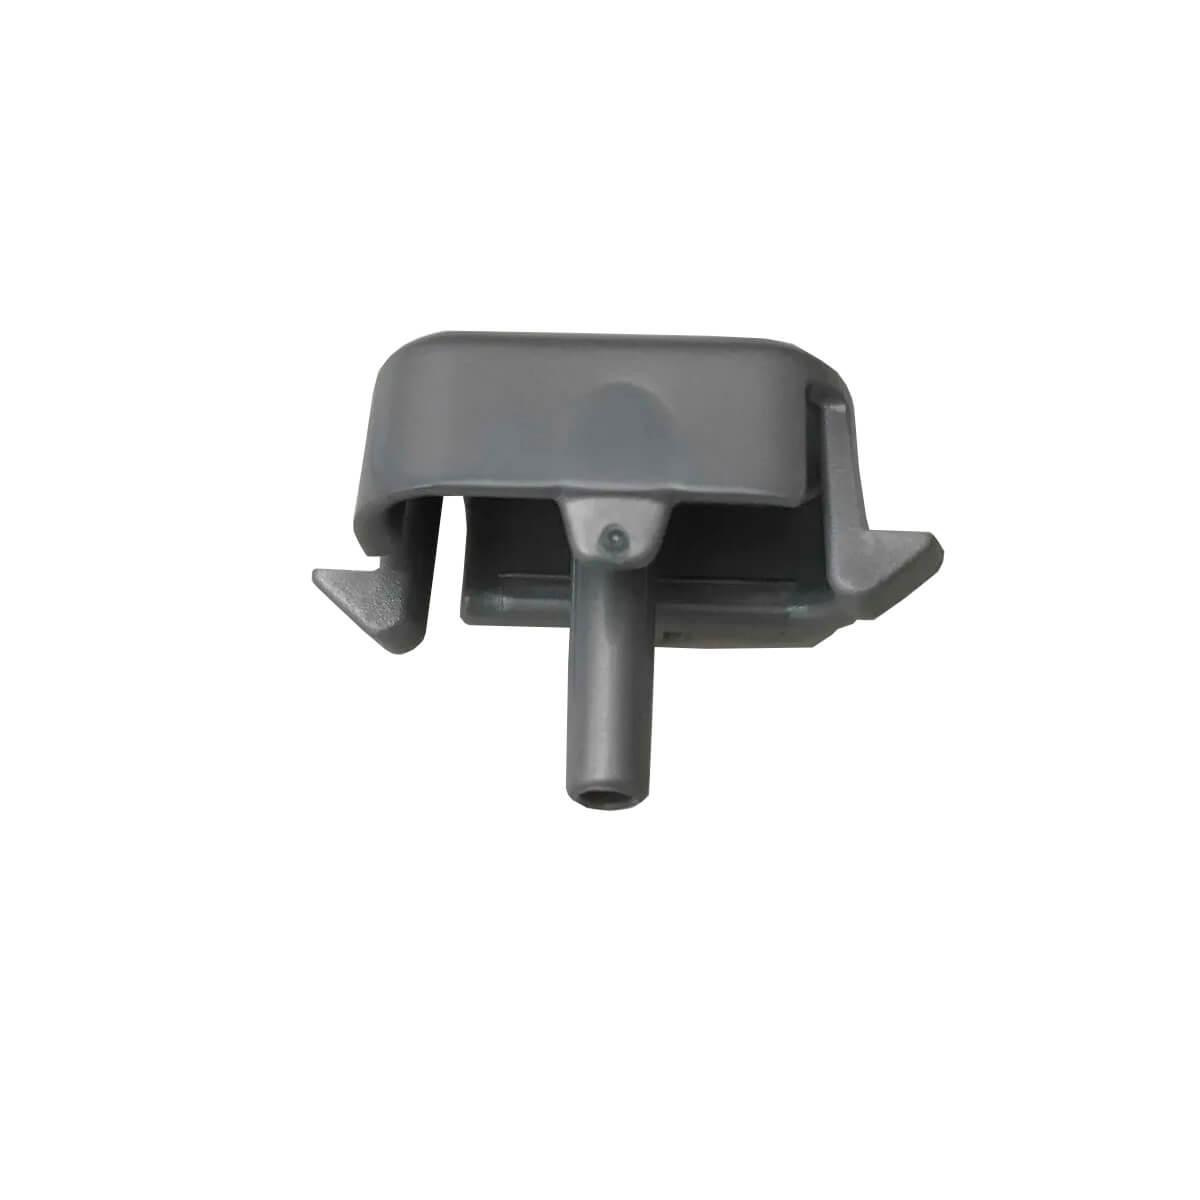 Tecla Avança Etapas Lavadora De Roupas Electrolux - 67400360